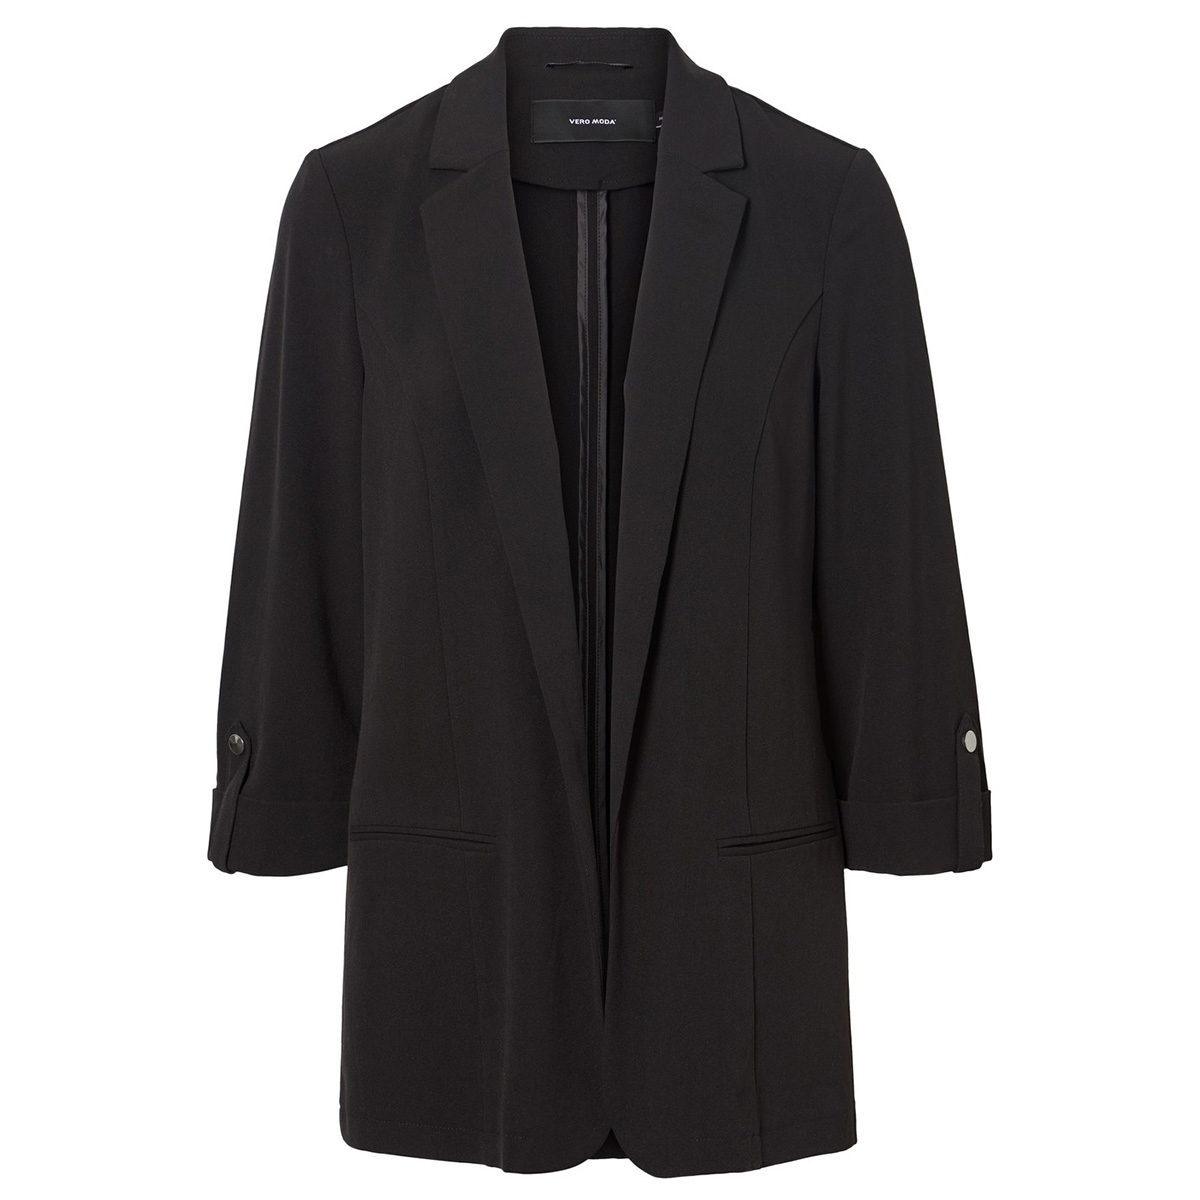 vmcissy 7/8 blazer 10219988 vero moda blazer black